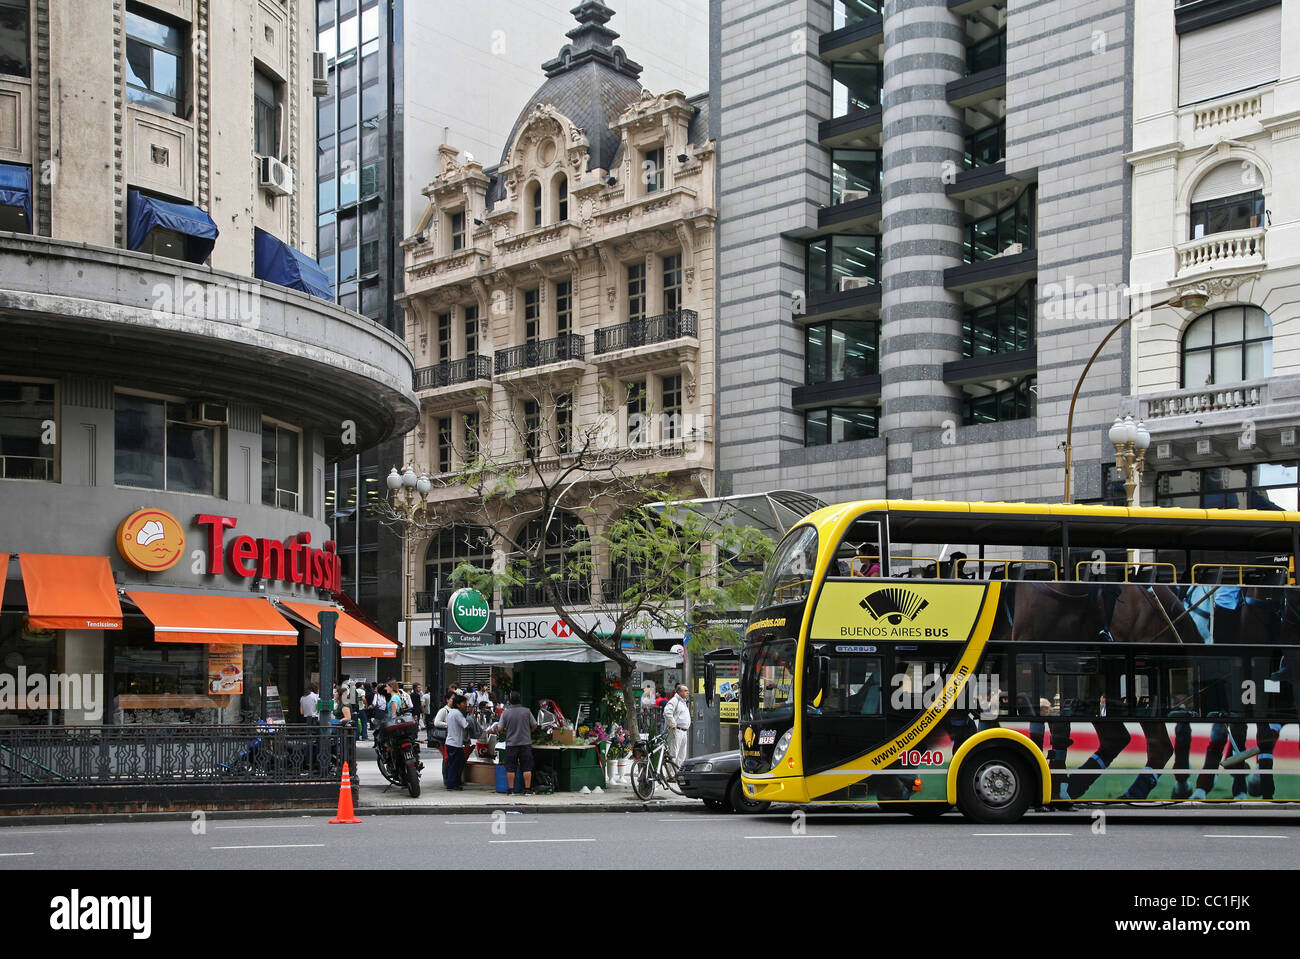 Public transport in Buenos Aires, Argentina - Stock Image